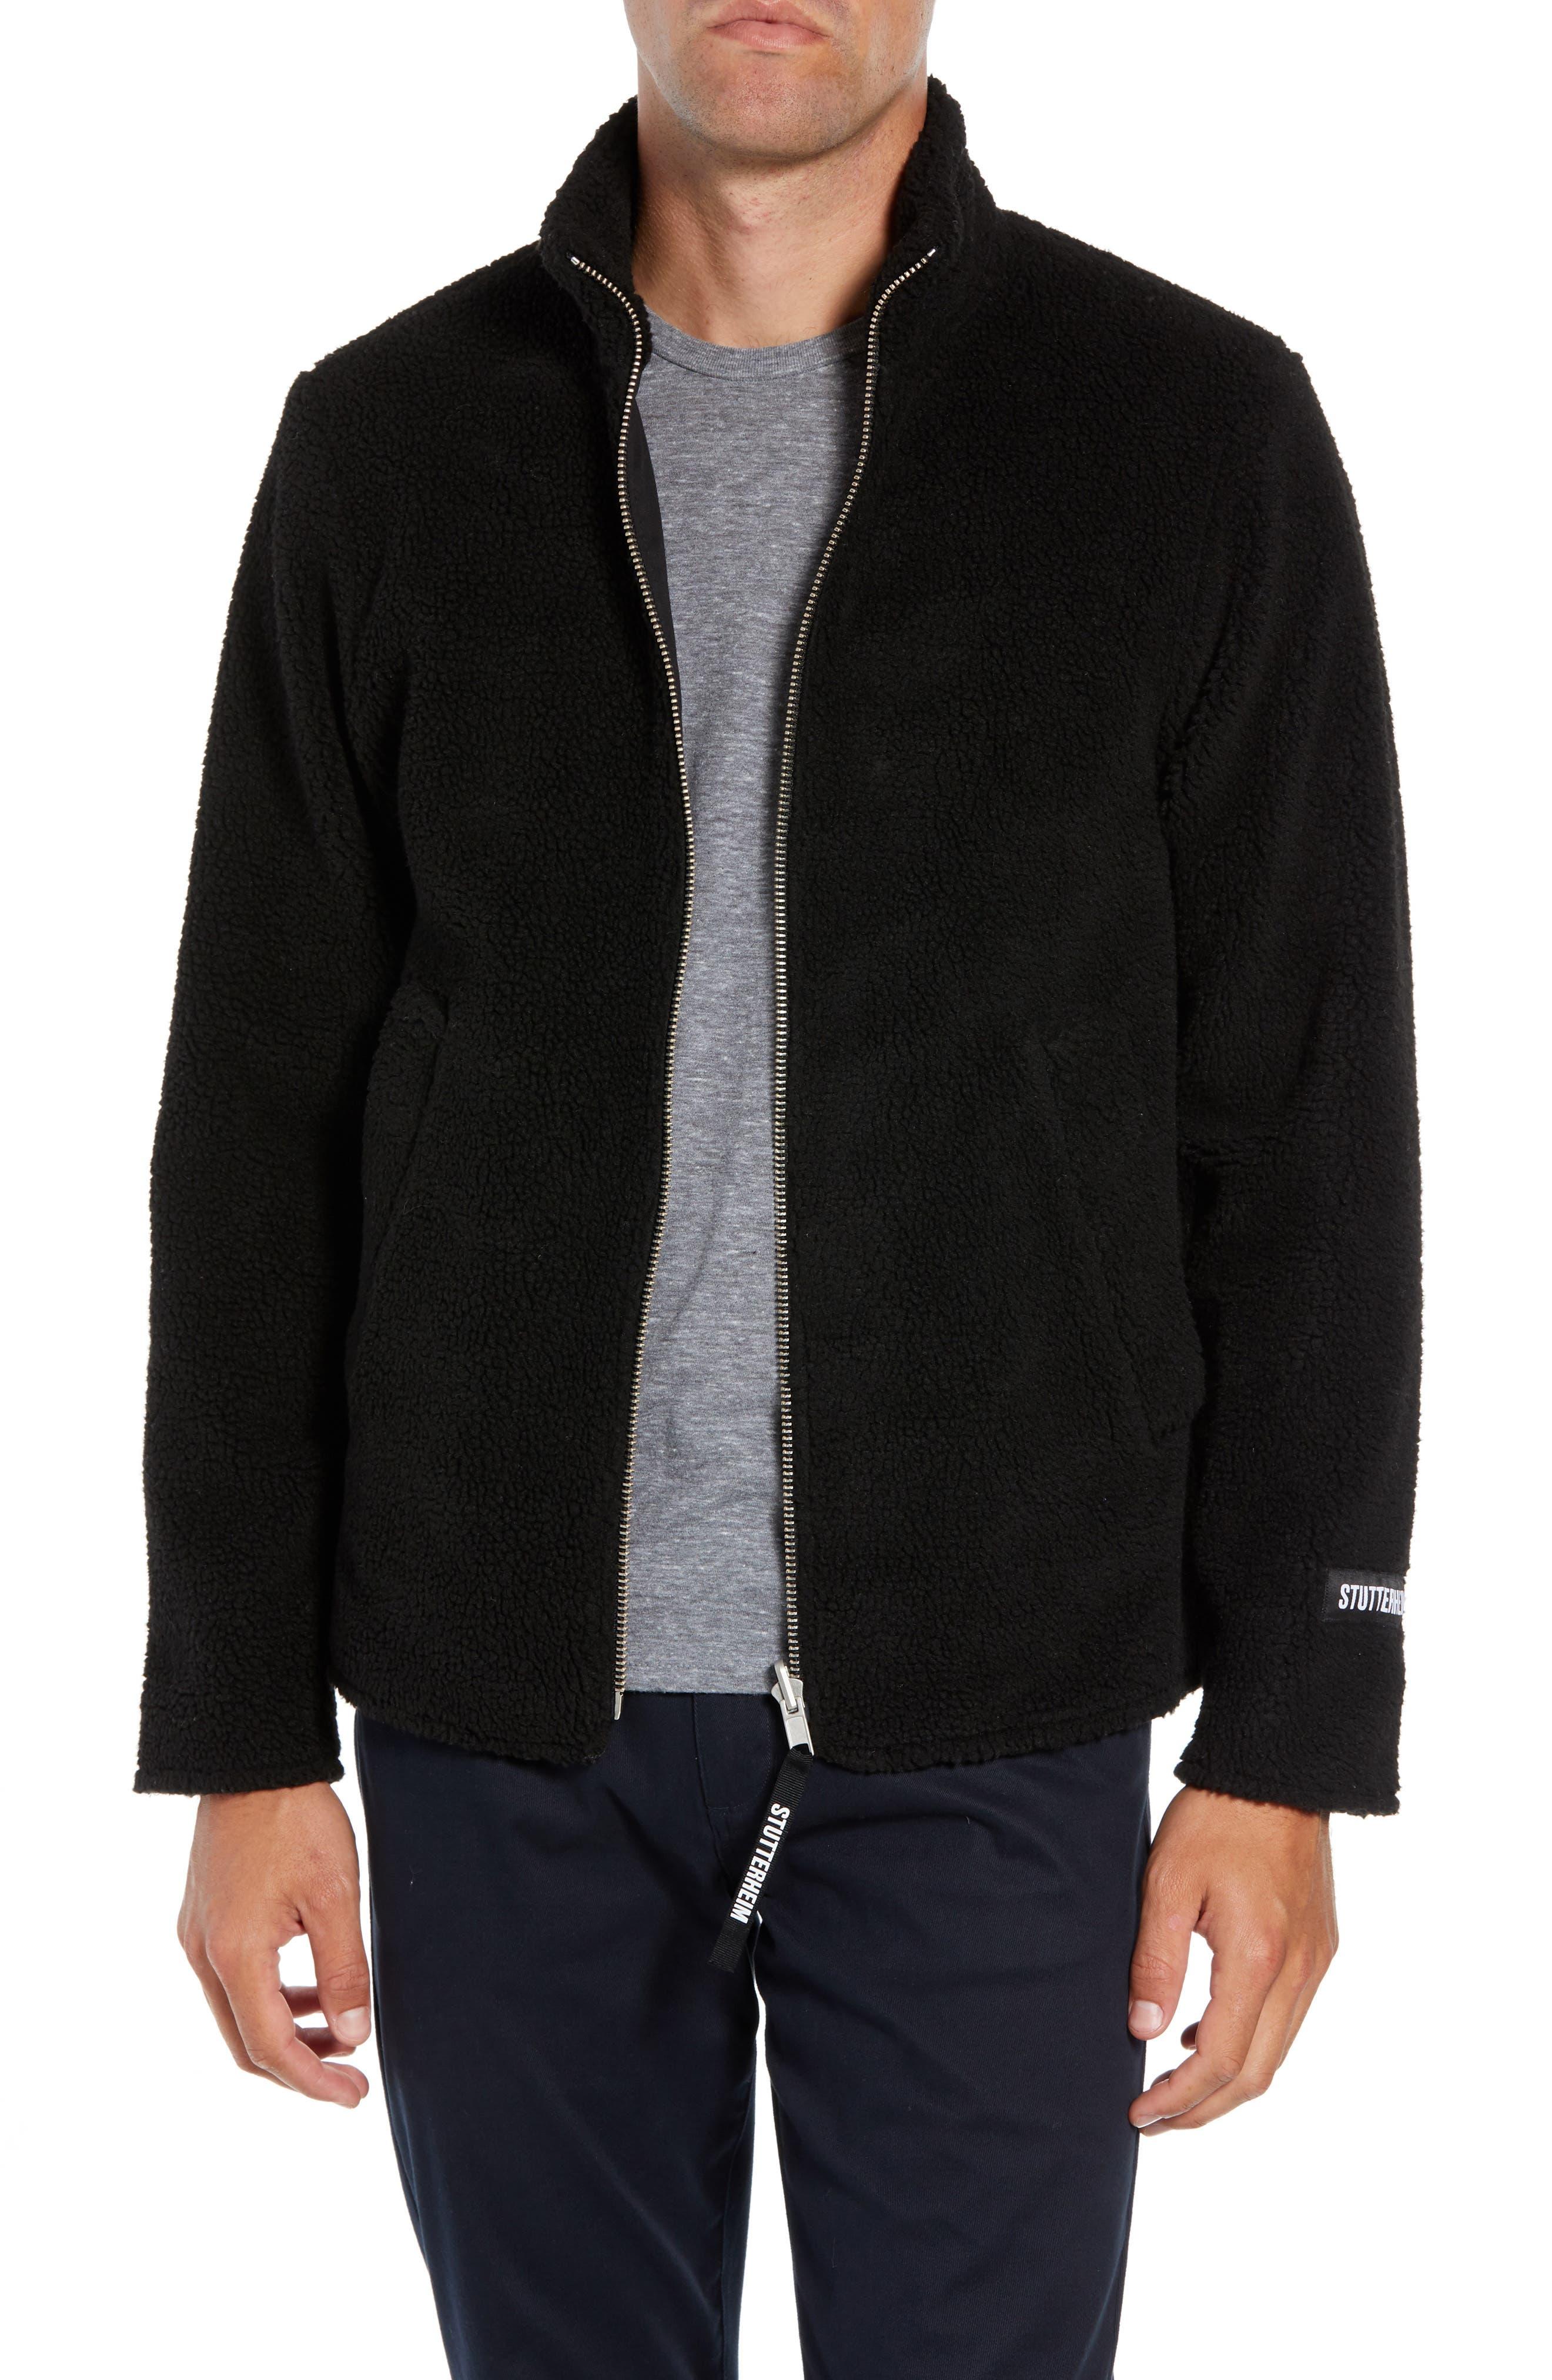 Varby Reversible Fleece Jacket,                         Main,                         color, BLACK